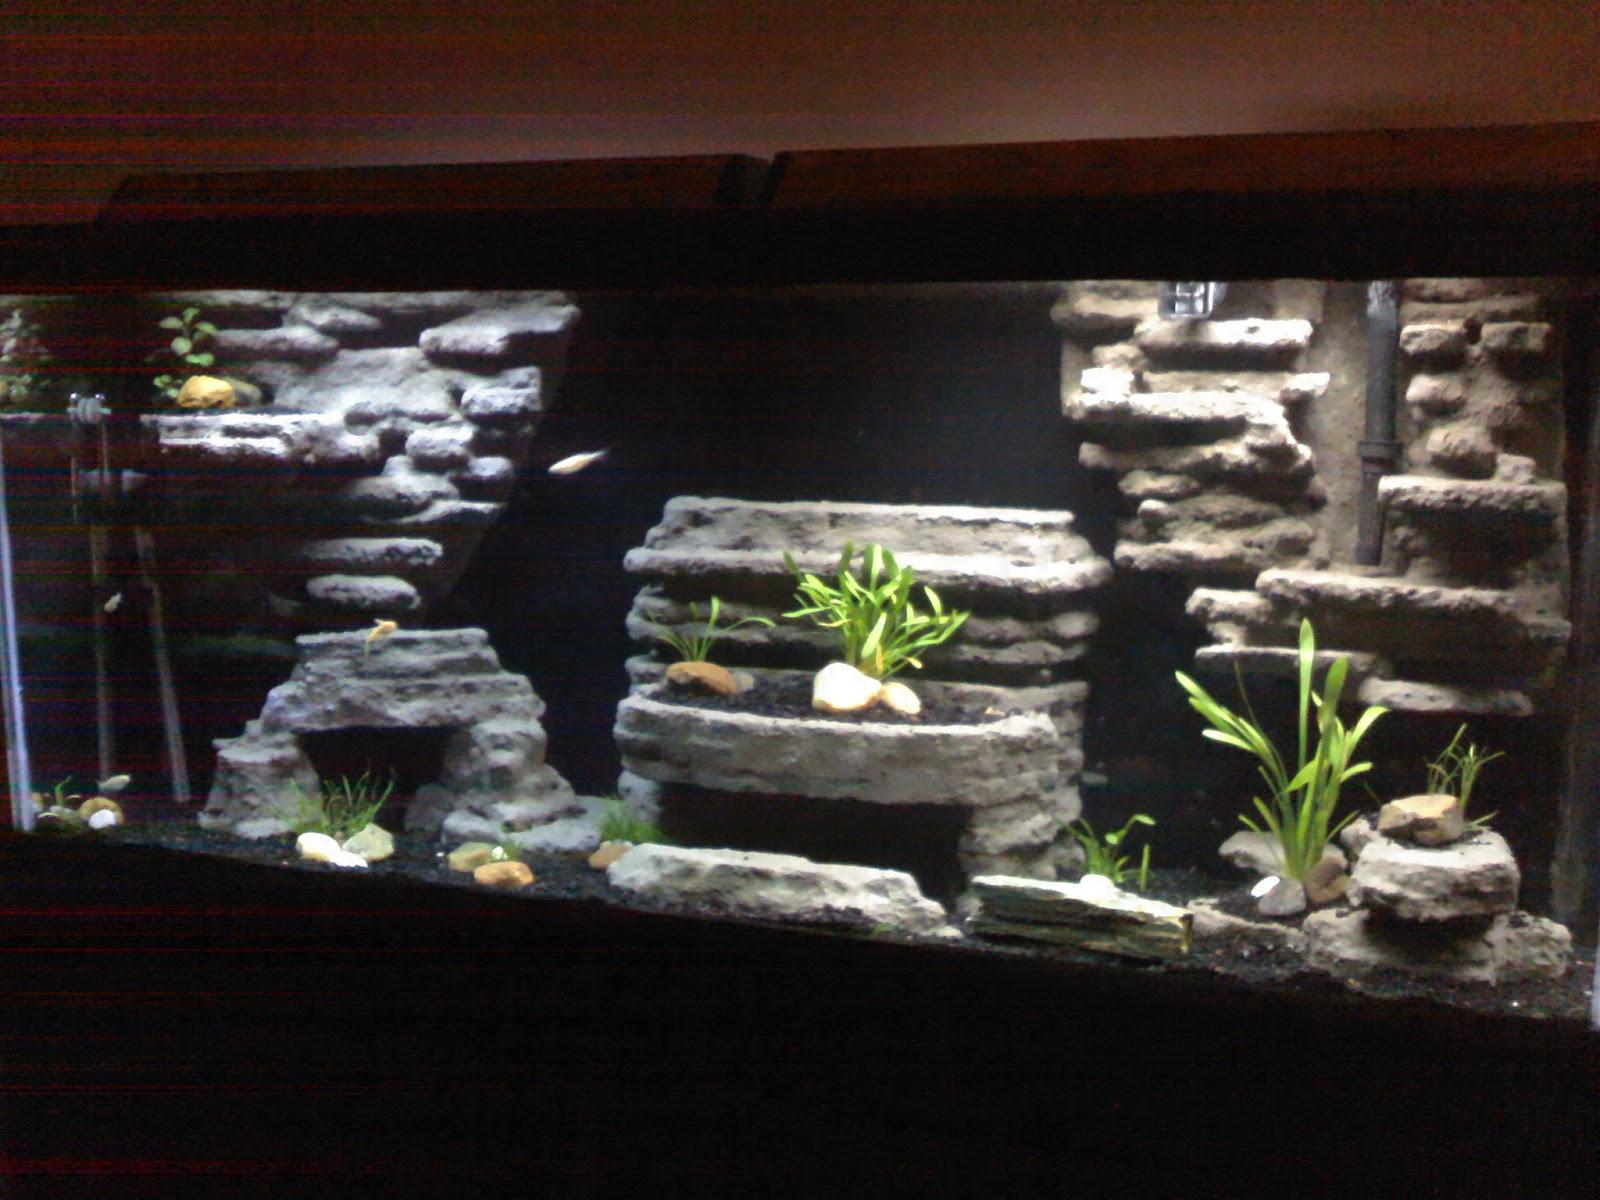 Decor Aquarium Polystyrene | Decoration For Home